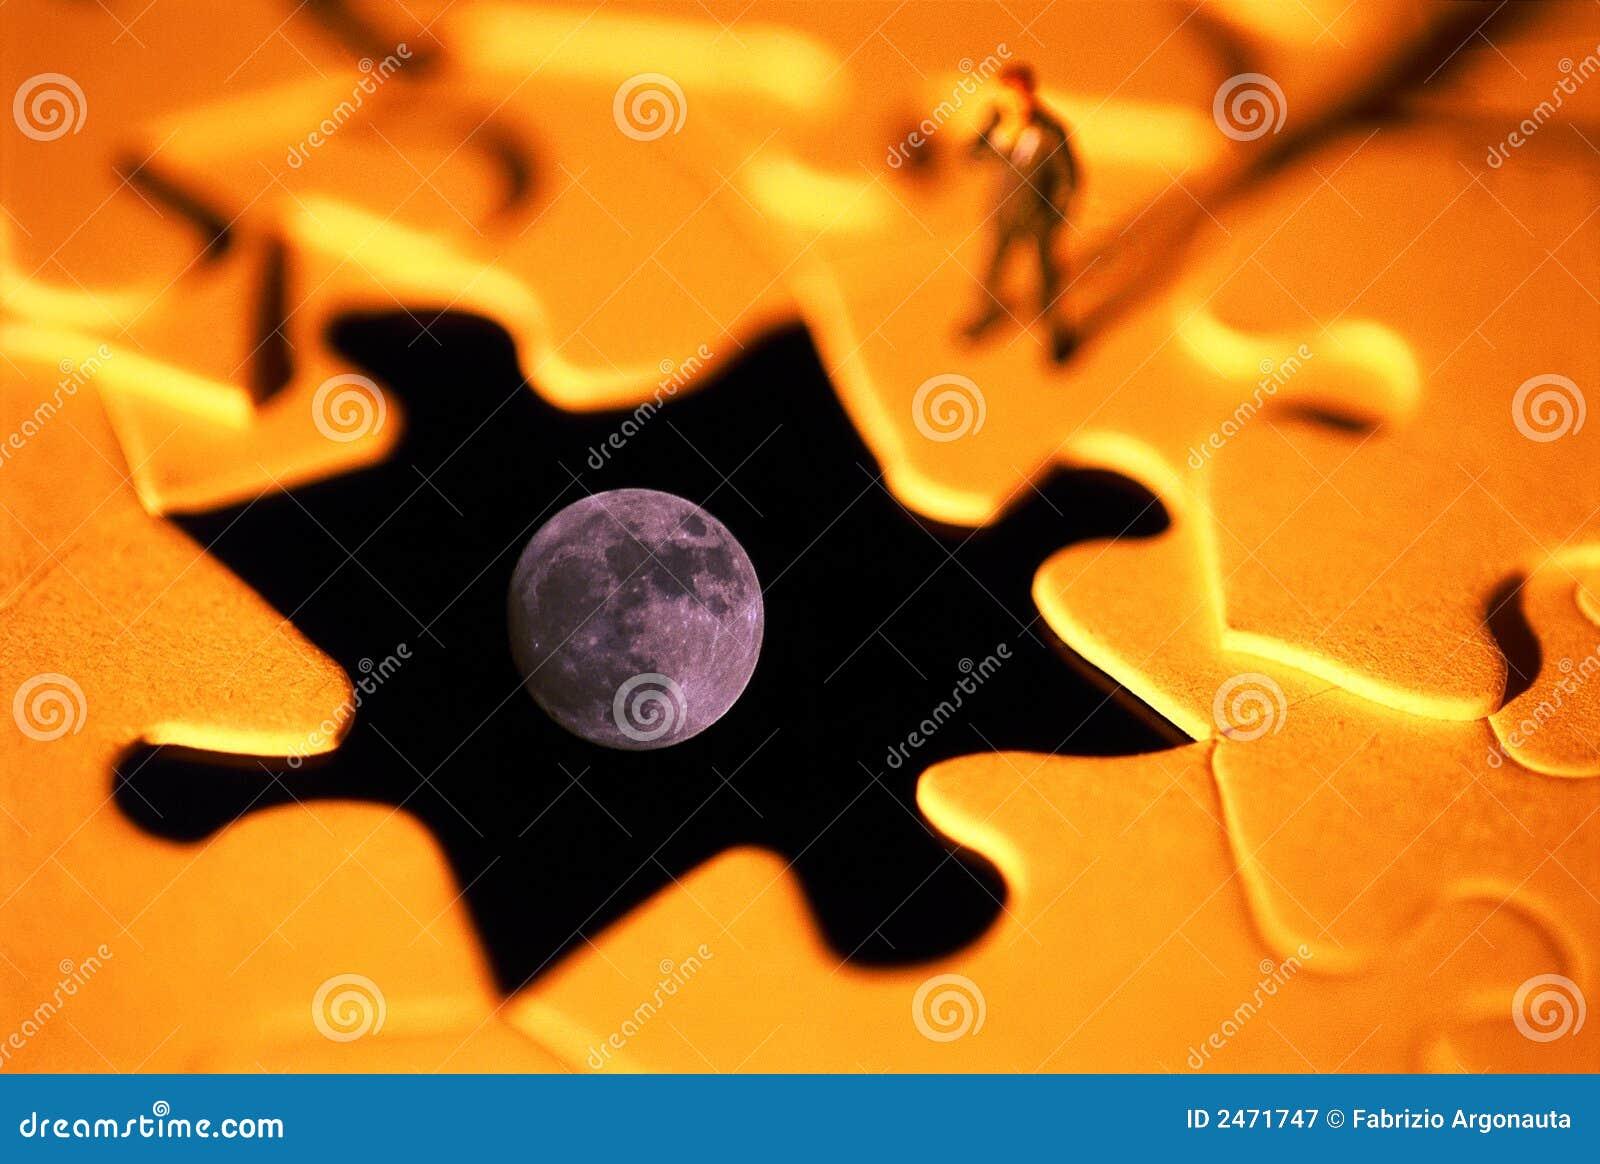 Mondpuzzlespielproblem